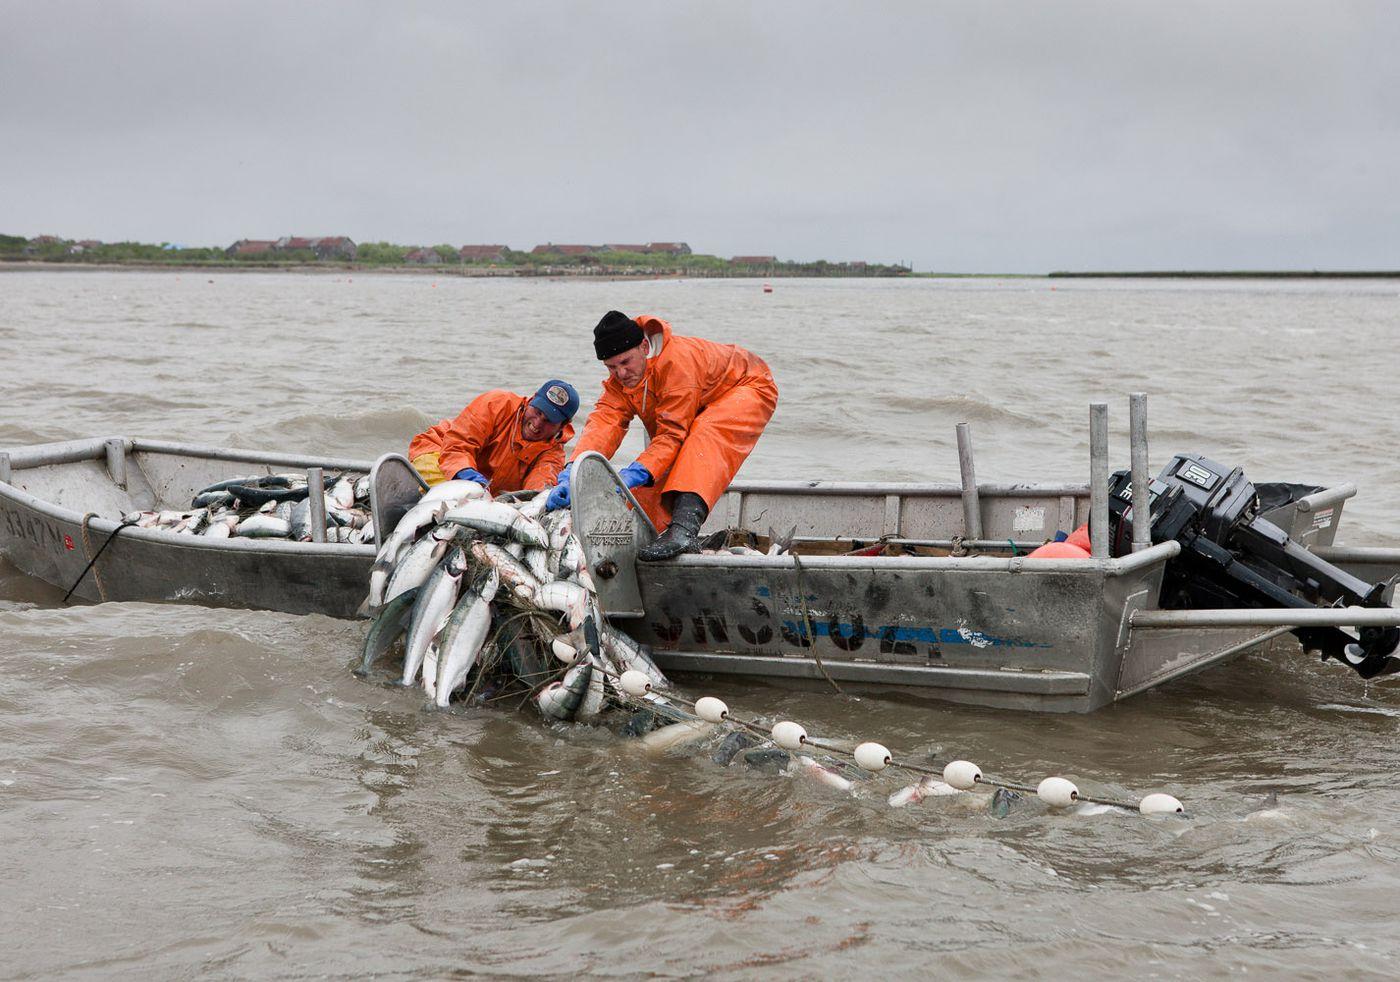 Graveyard Point setnetters pull in heavy gillnets filled with wild Alaska sockeye salmon. June 27, 2011 (Courtesy Corey Arnold)